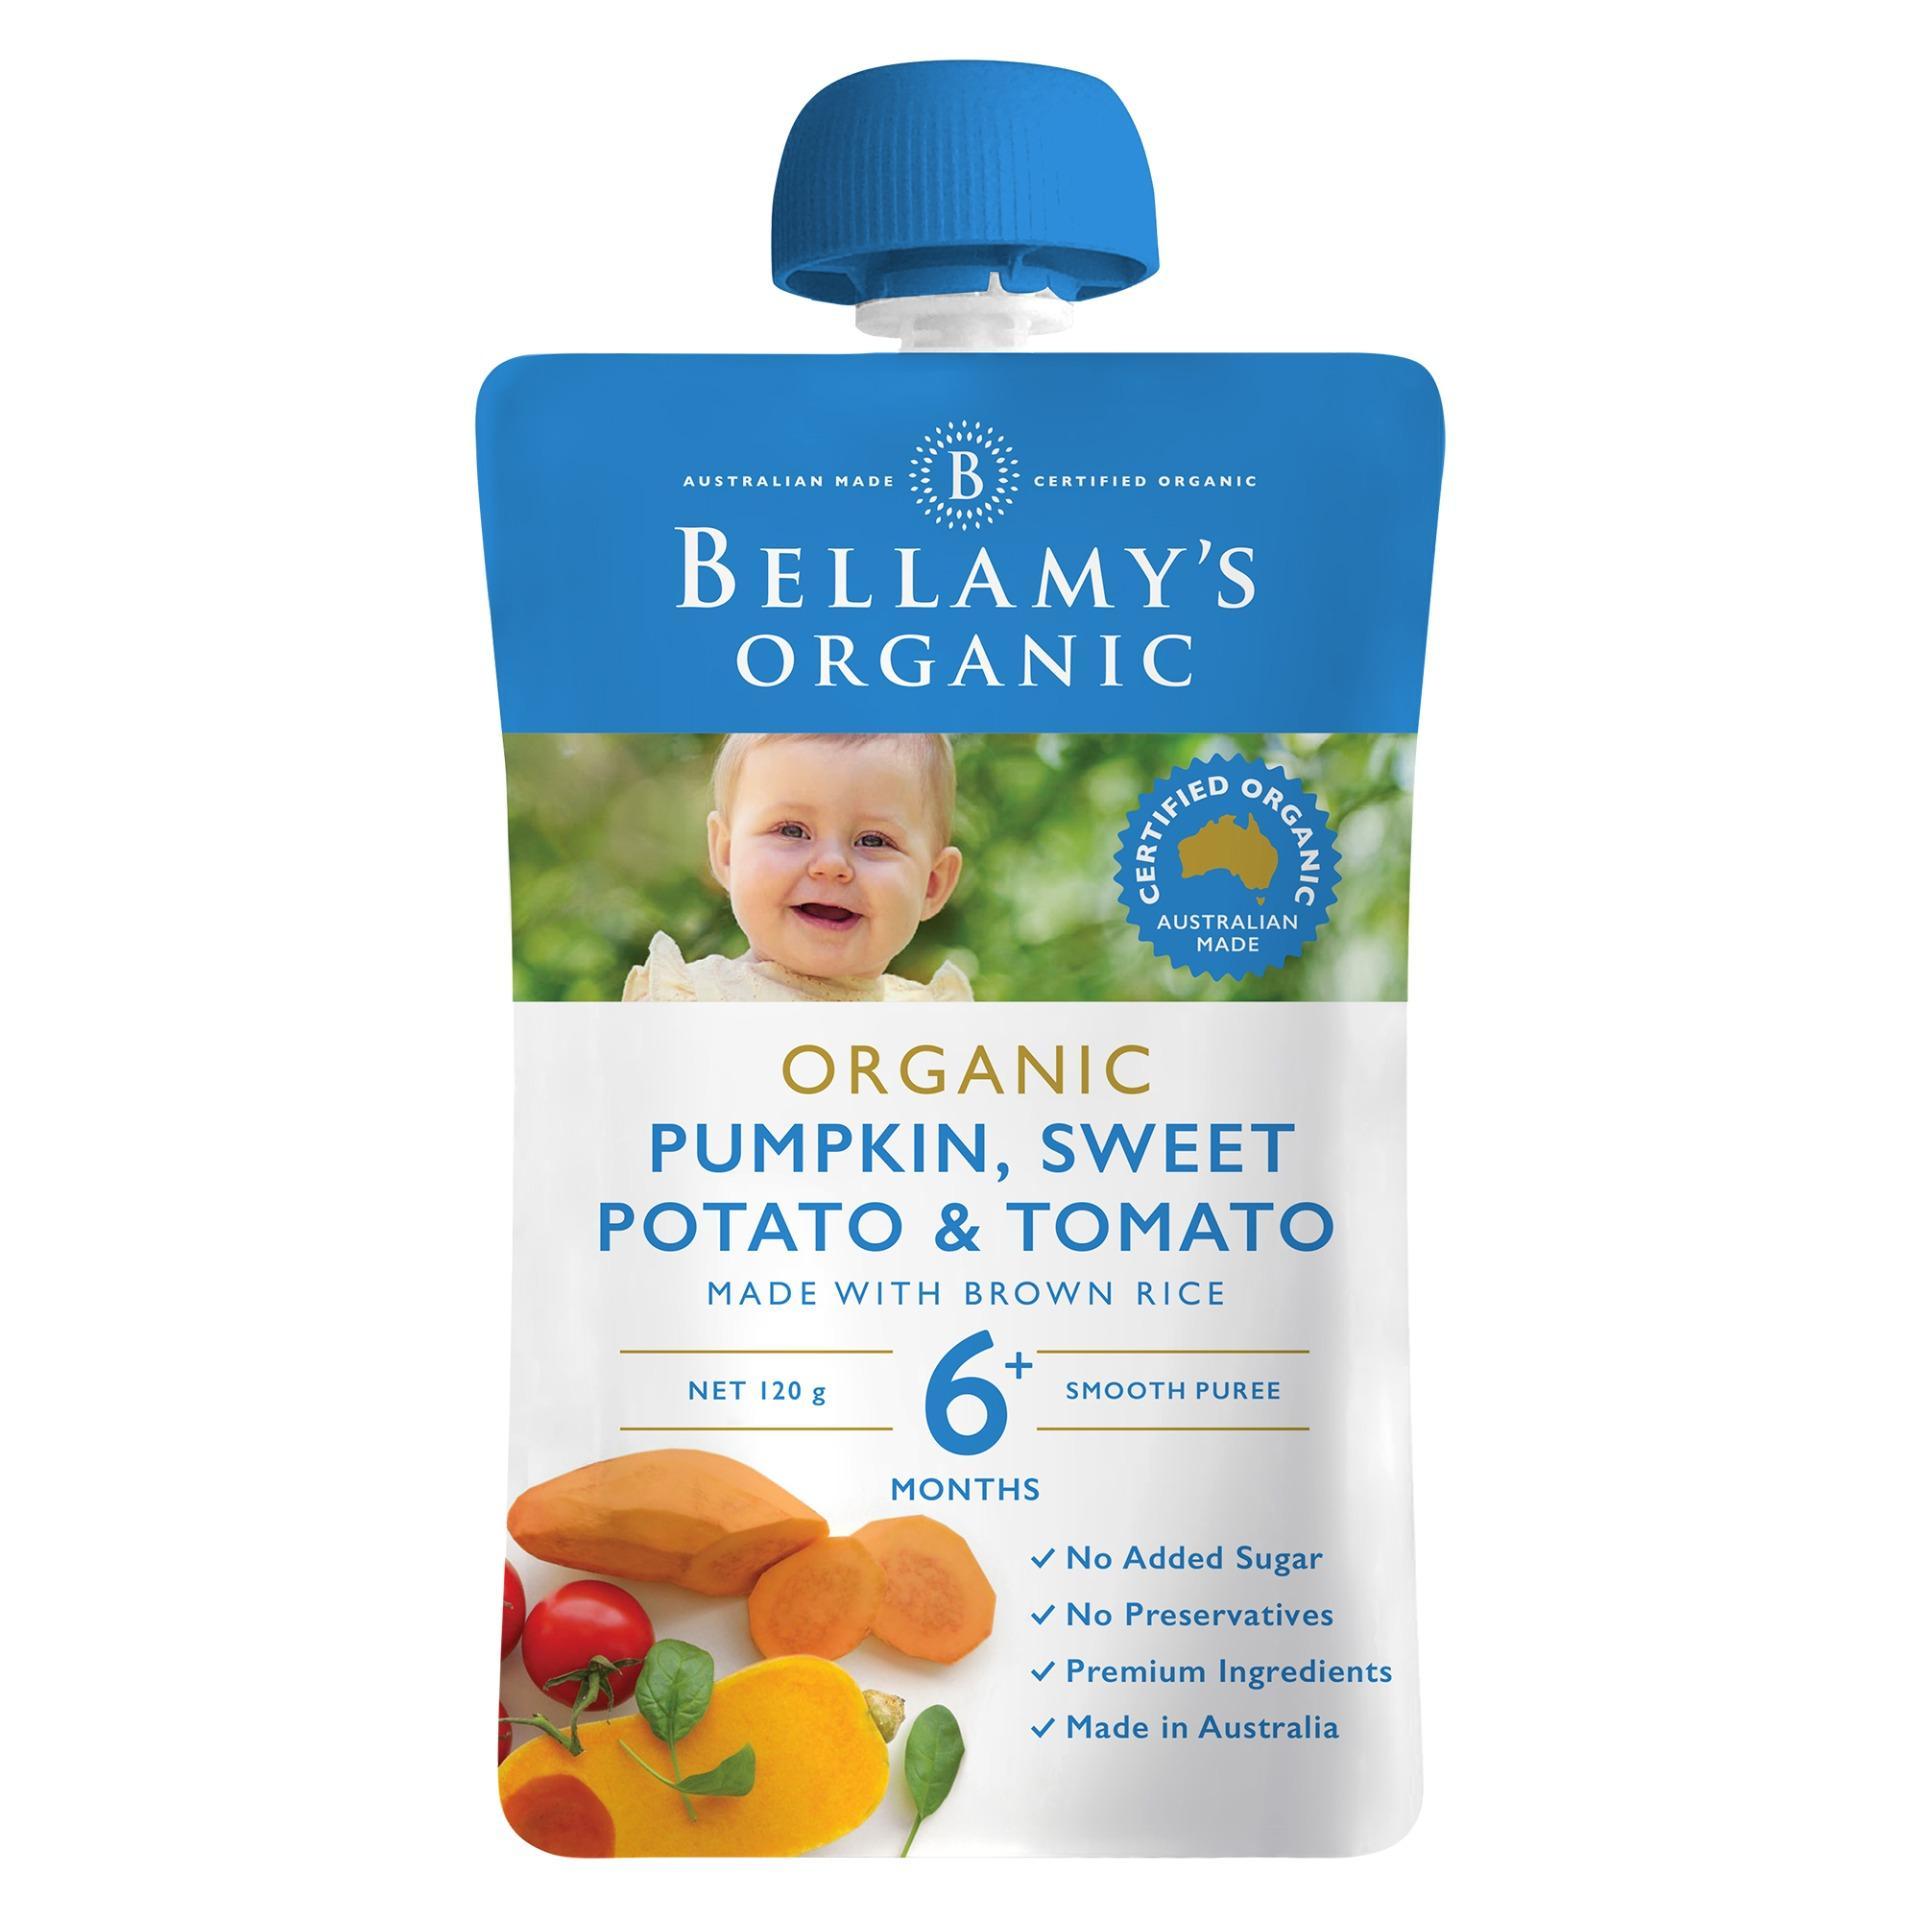 Bellamys Organic Pumpkin, Sweet Potato & Tomato By Lazada Retail Bellamys Organic.